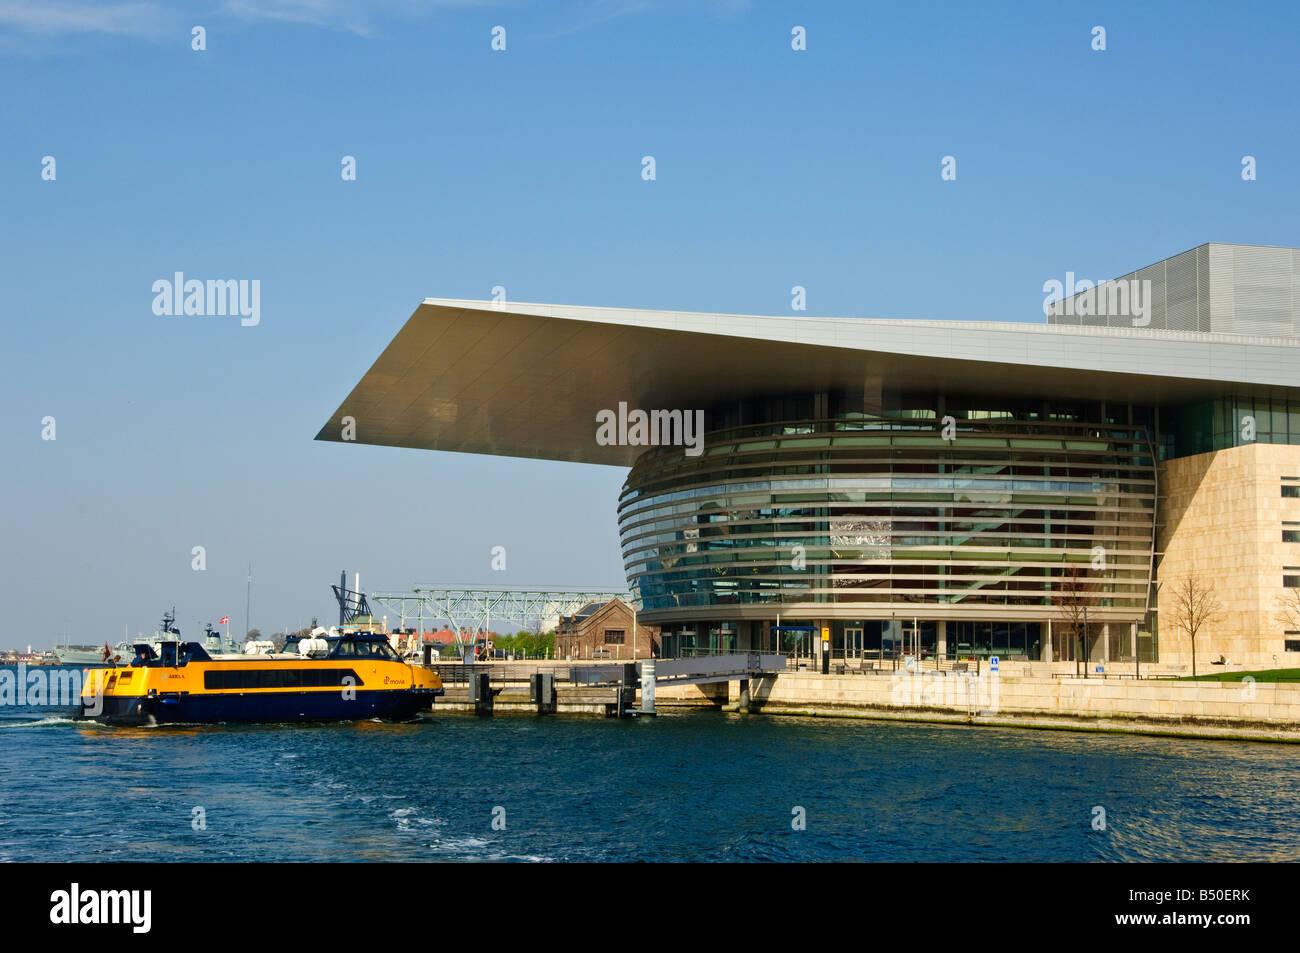 Waterbus calling at Operaen the Opera House København Copenhagen opened 2005 architect Henning Larsen - Stock Image